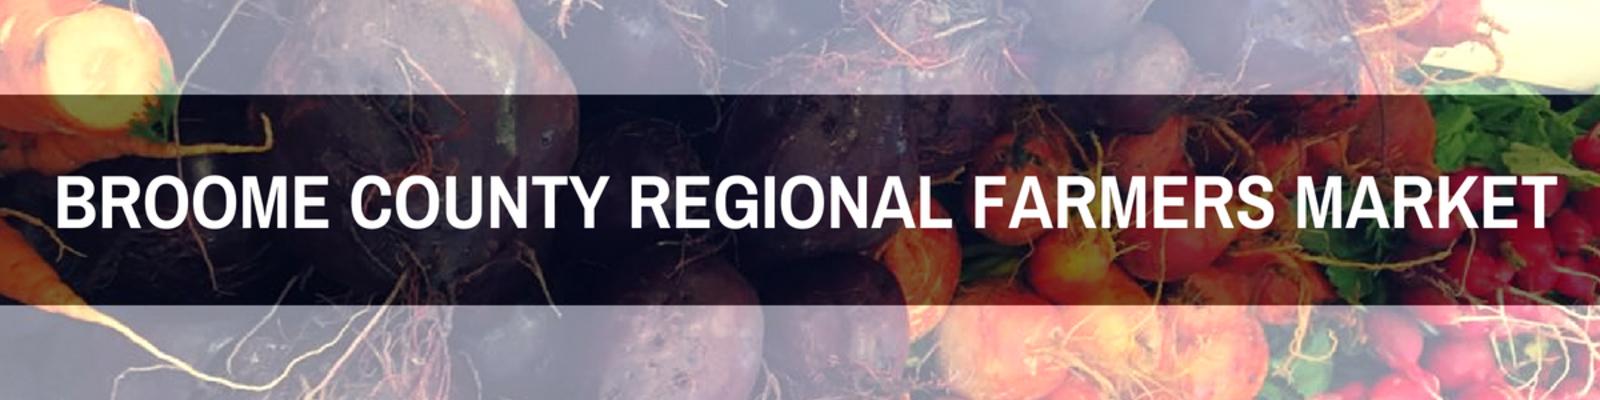 Broome County Regional Farmers Market